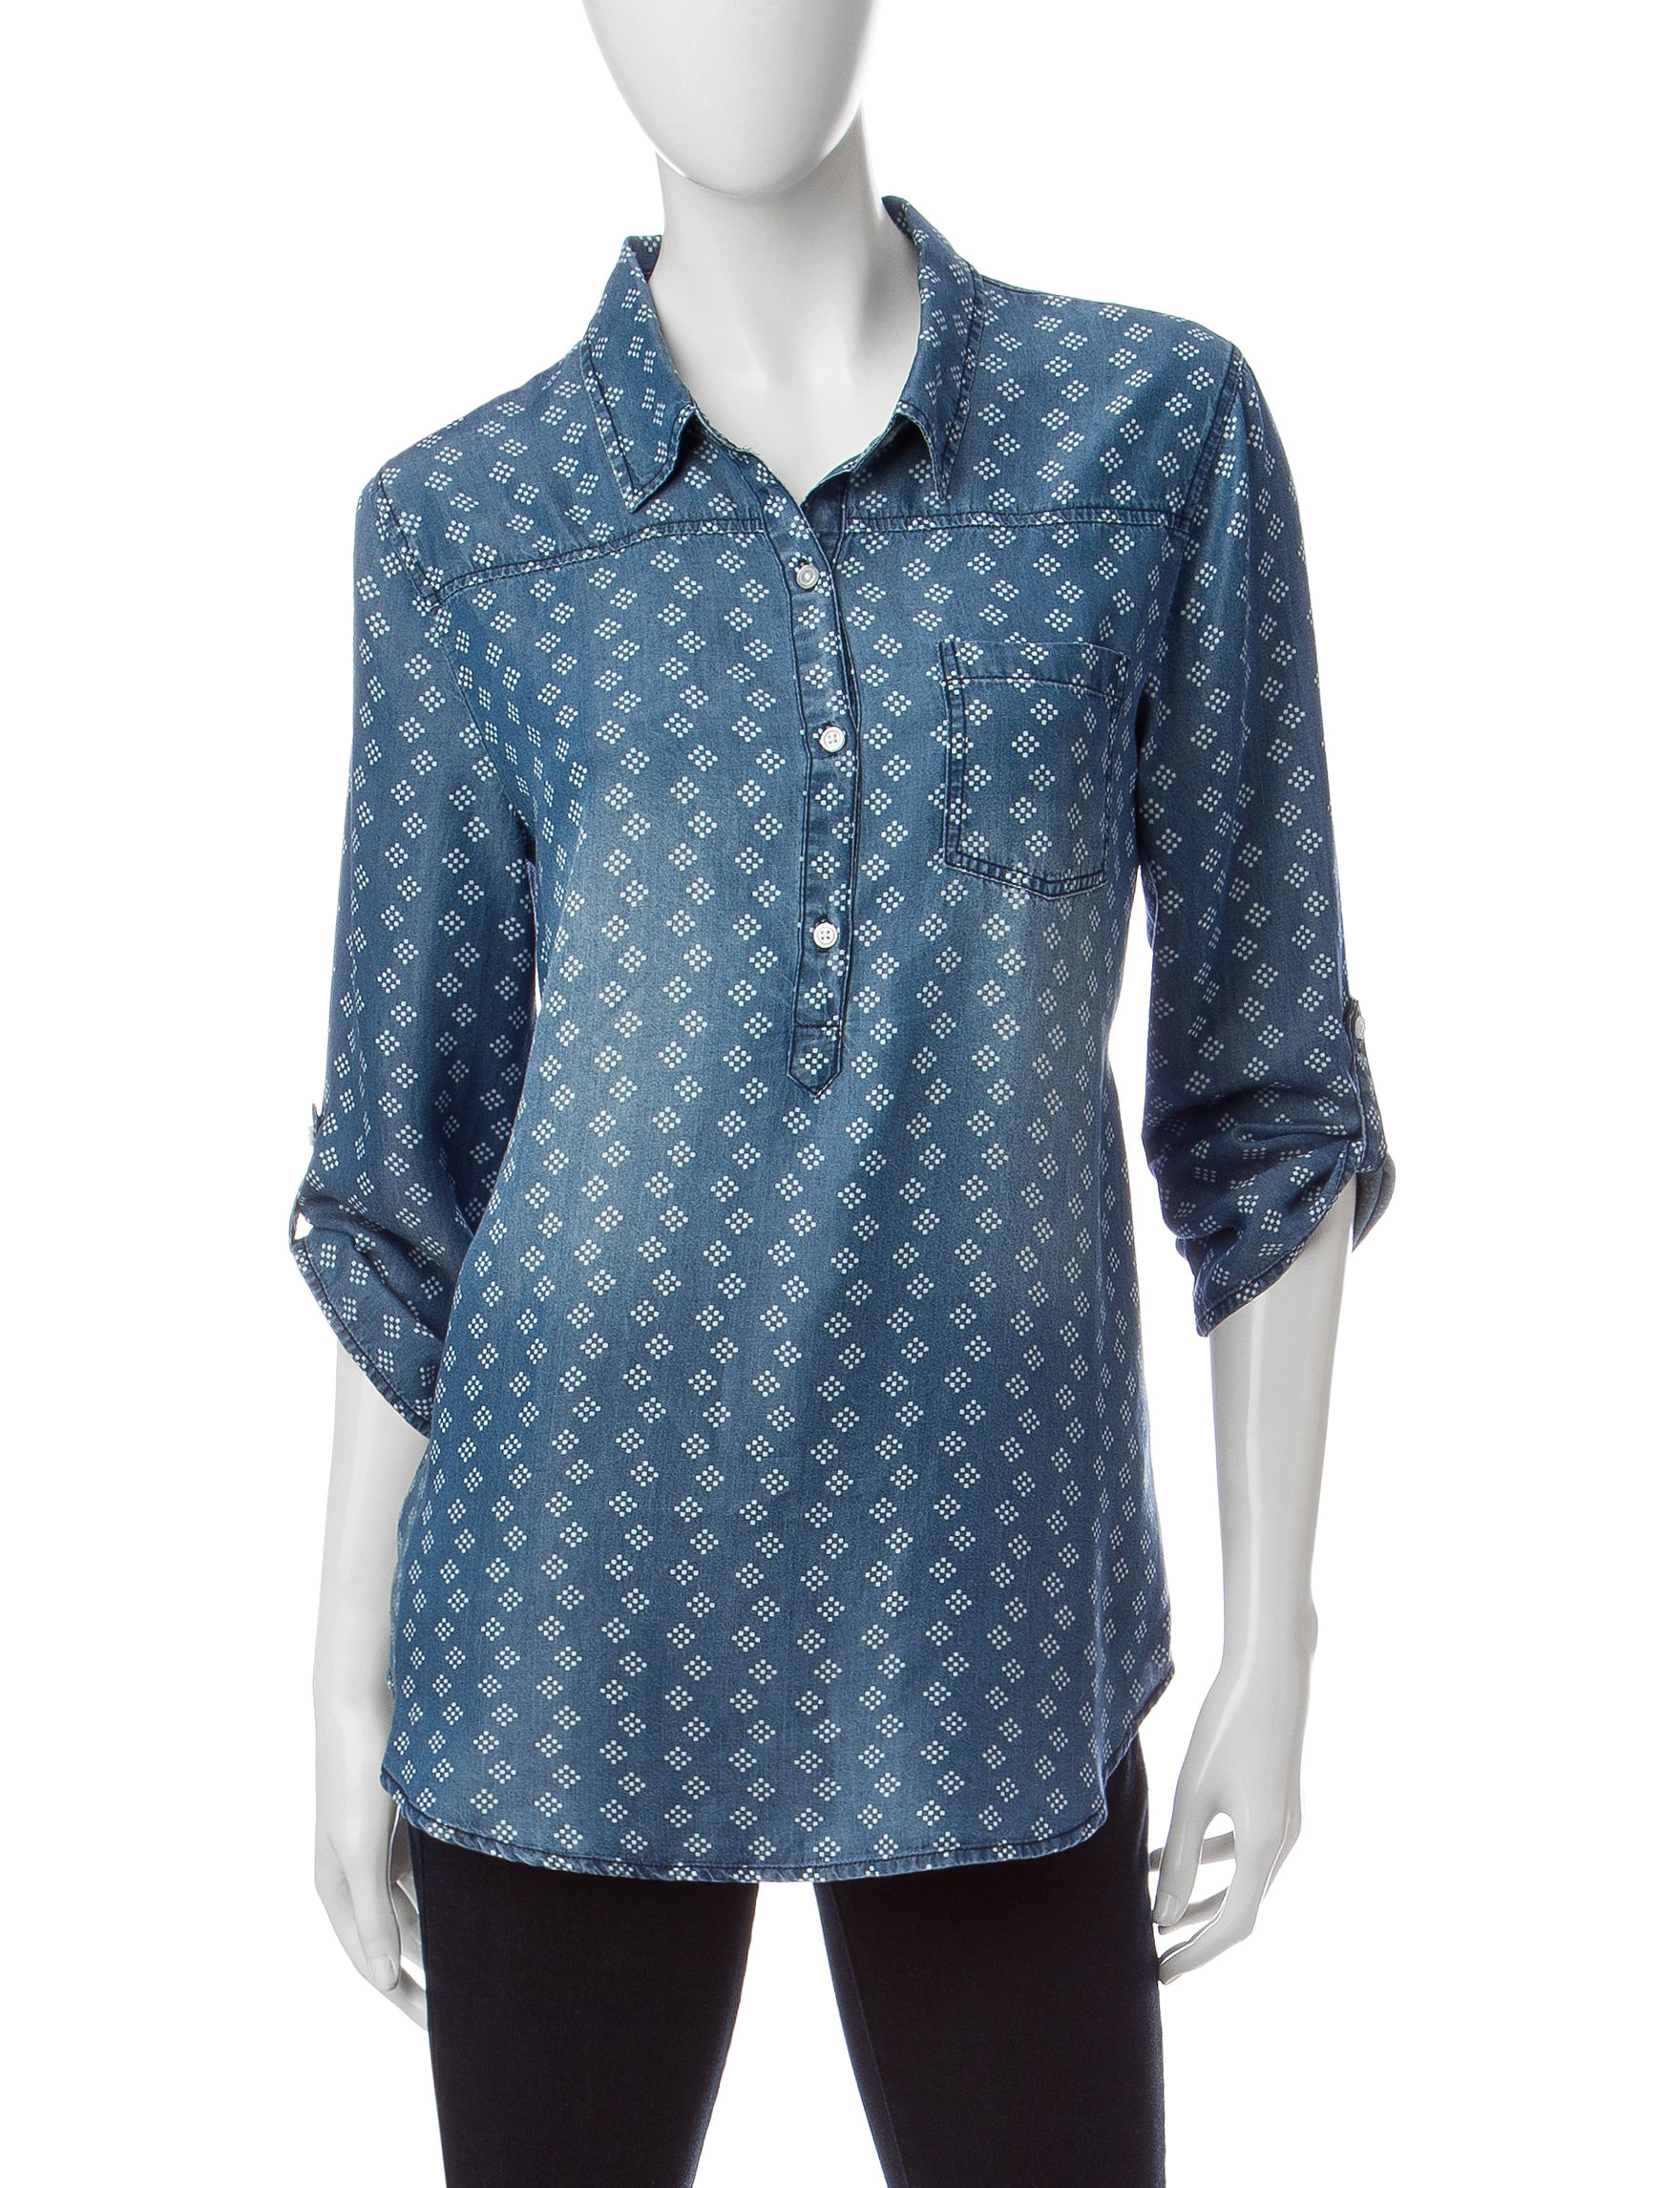 Heart Soul Blue / White Shirts & Blouses